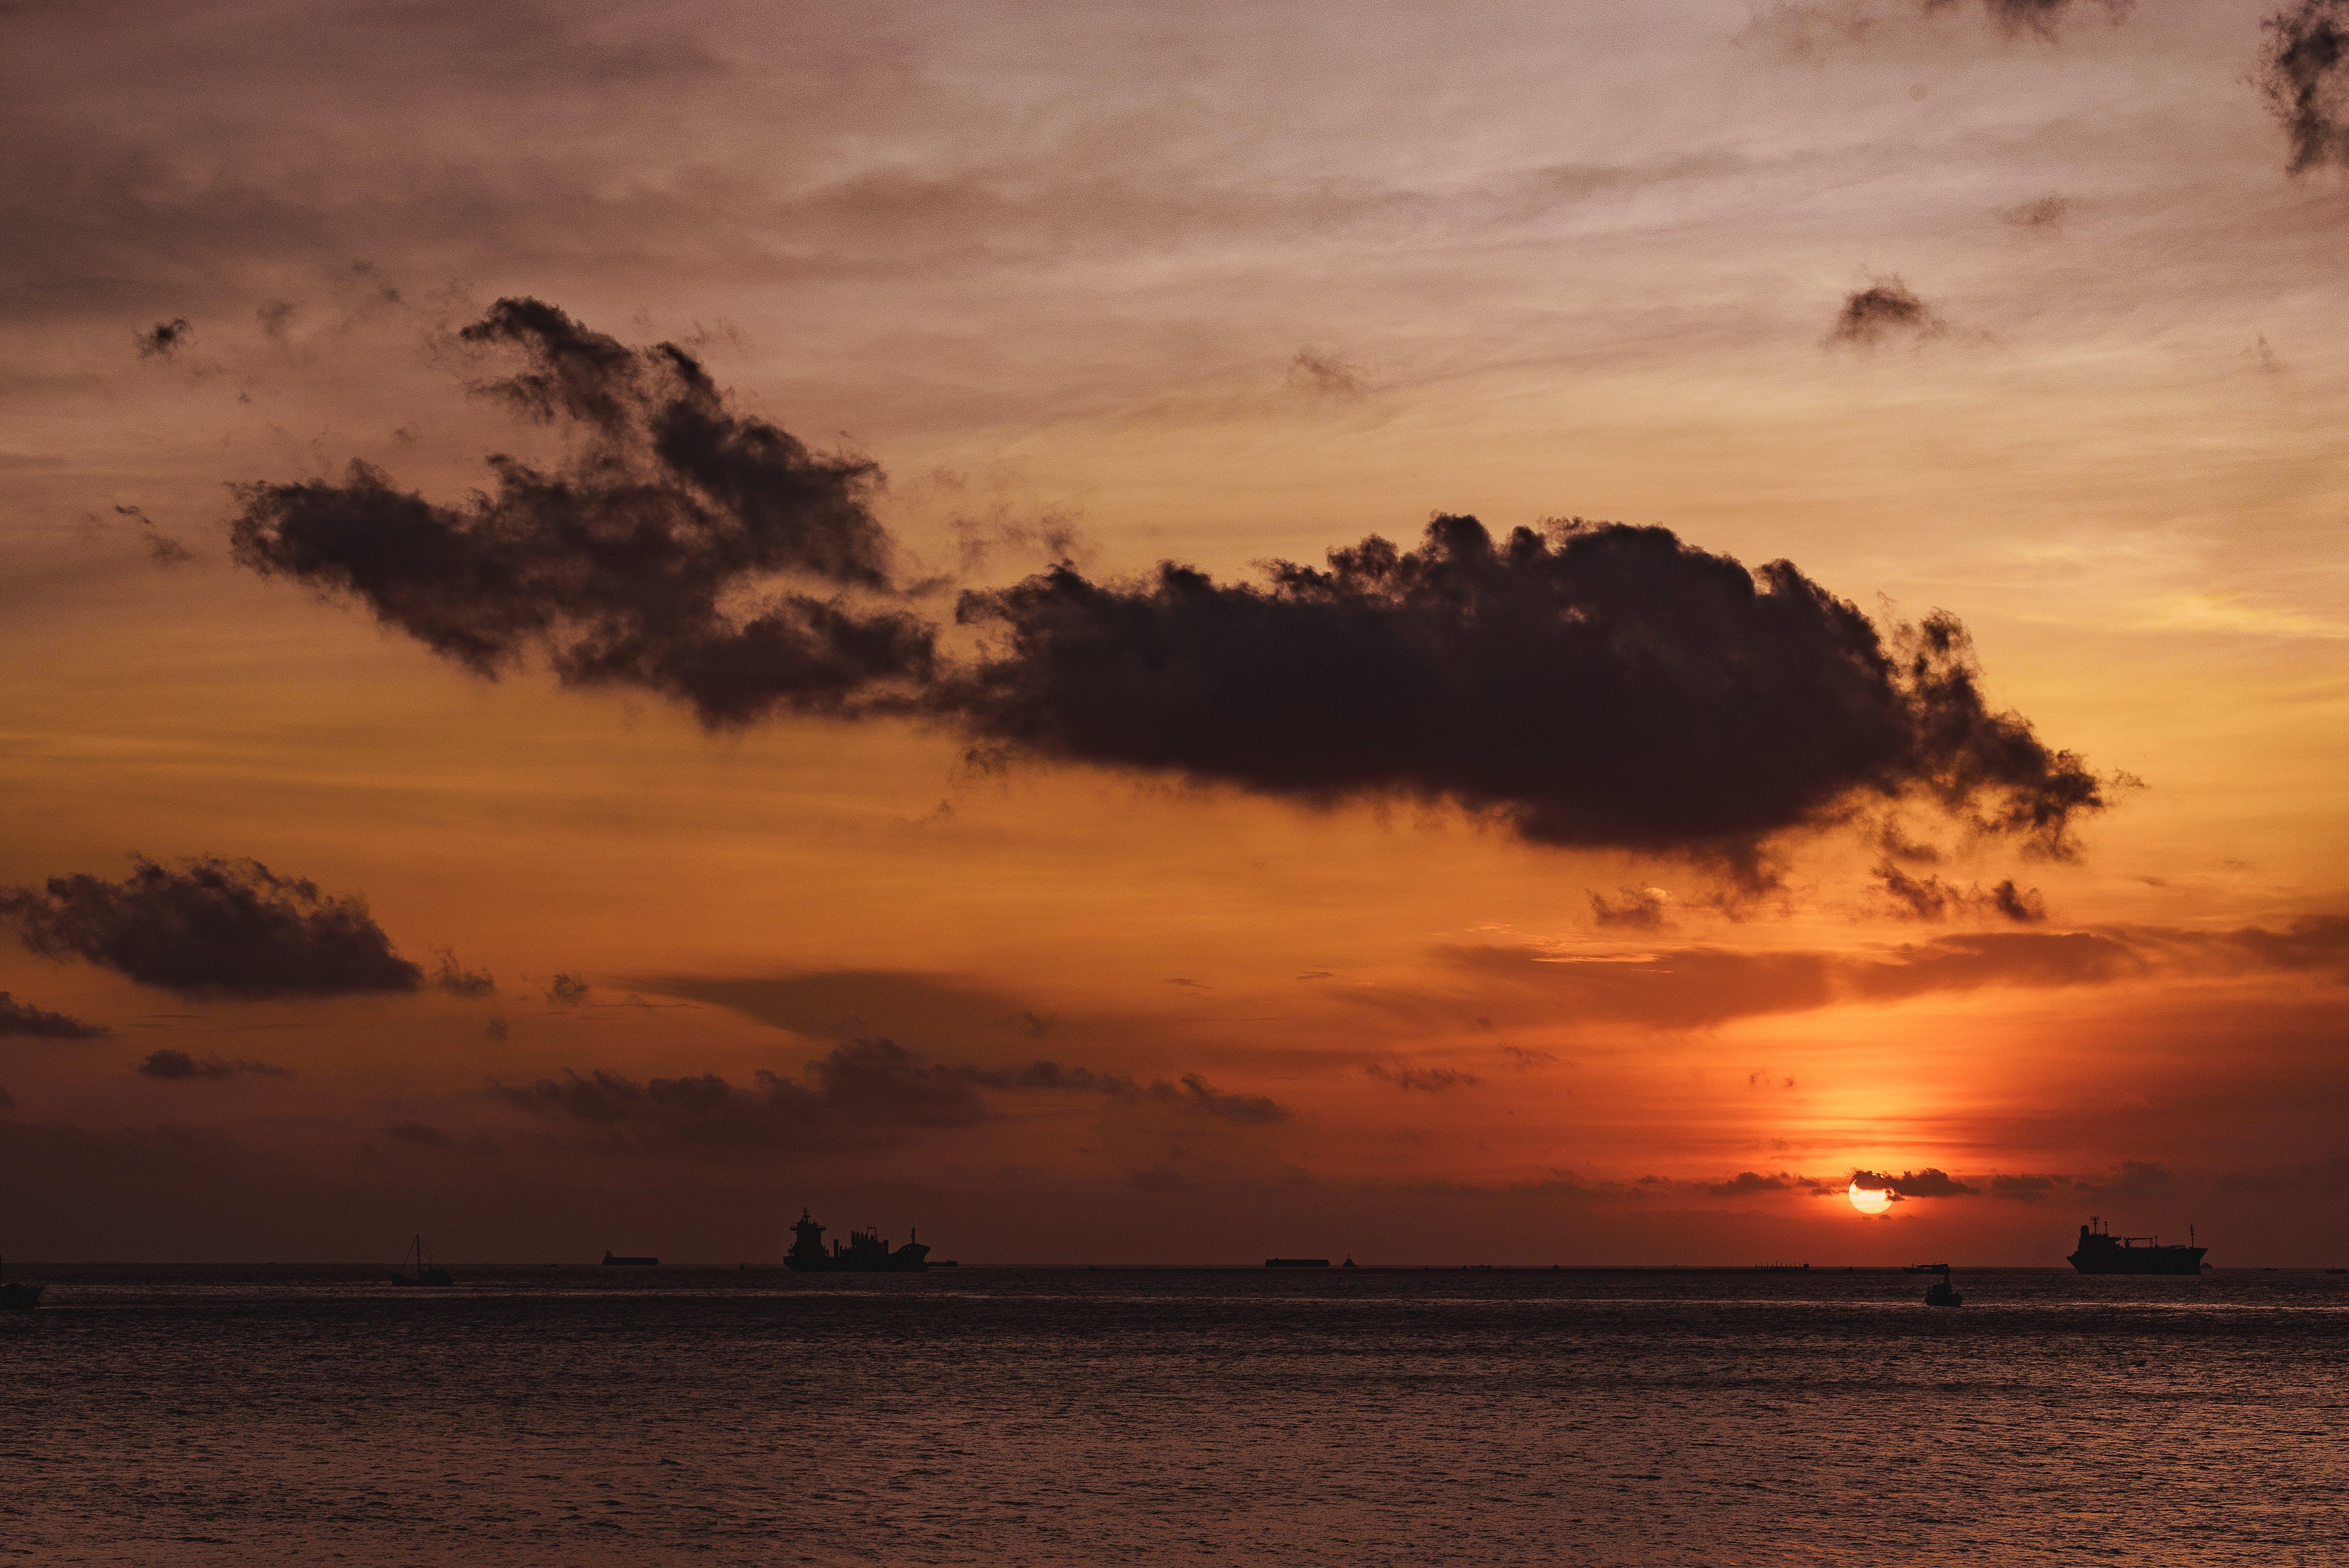 Free stock photo of A-Asia, auragramz, beach, blue sky